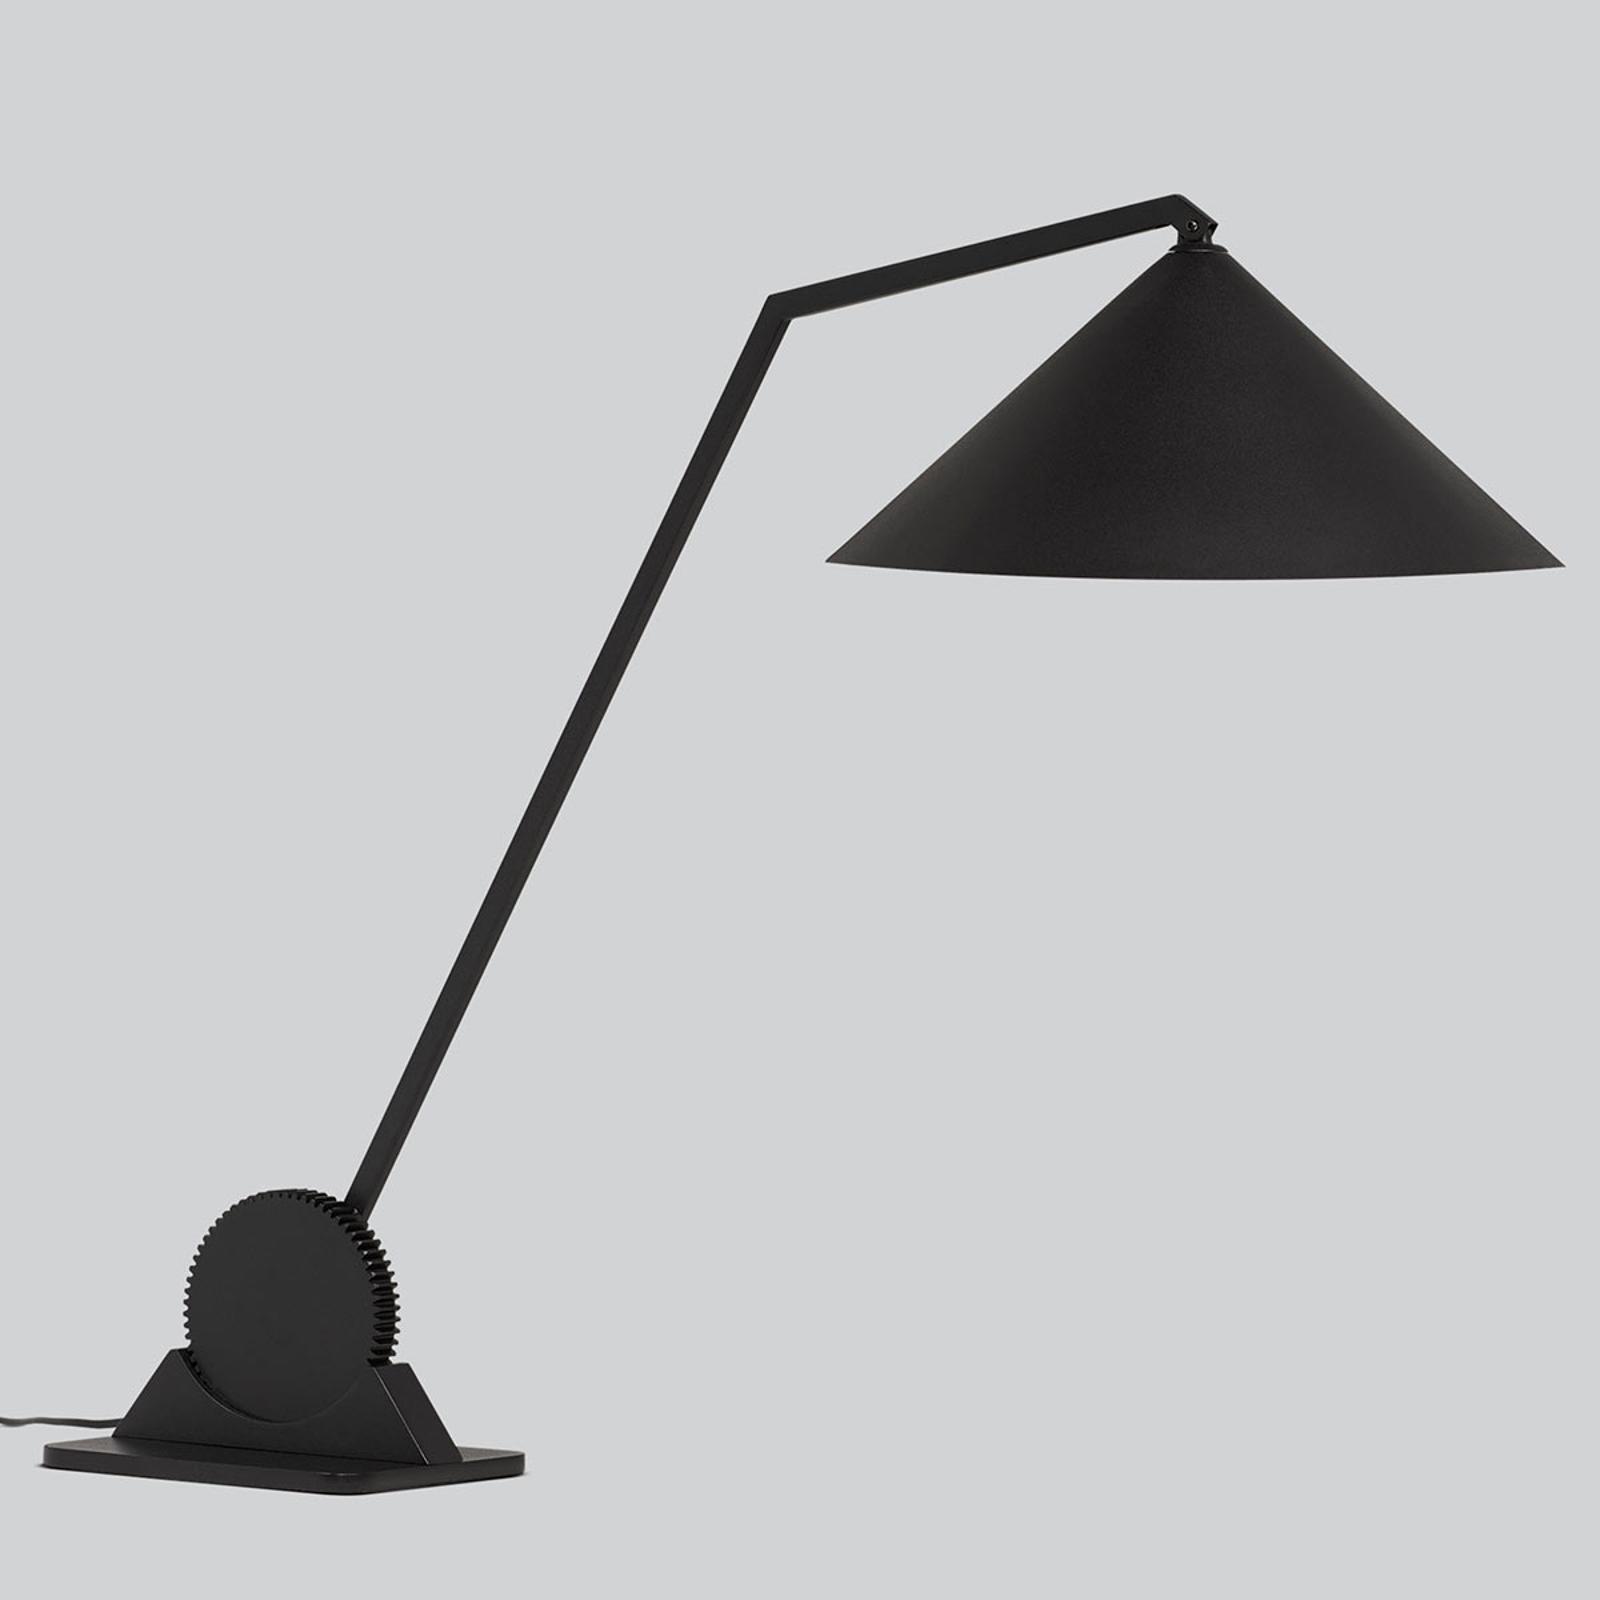 Northern Gear Table lampe à poser à 1 lampe